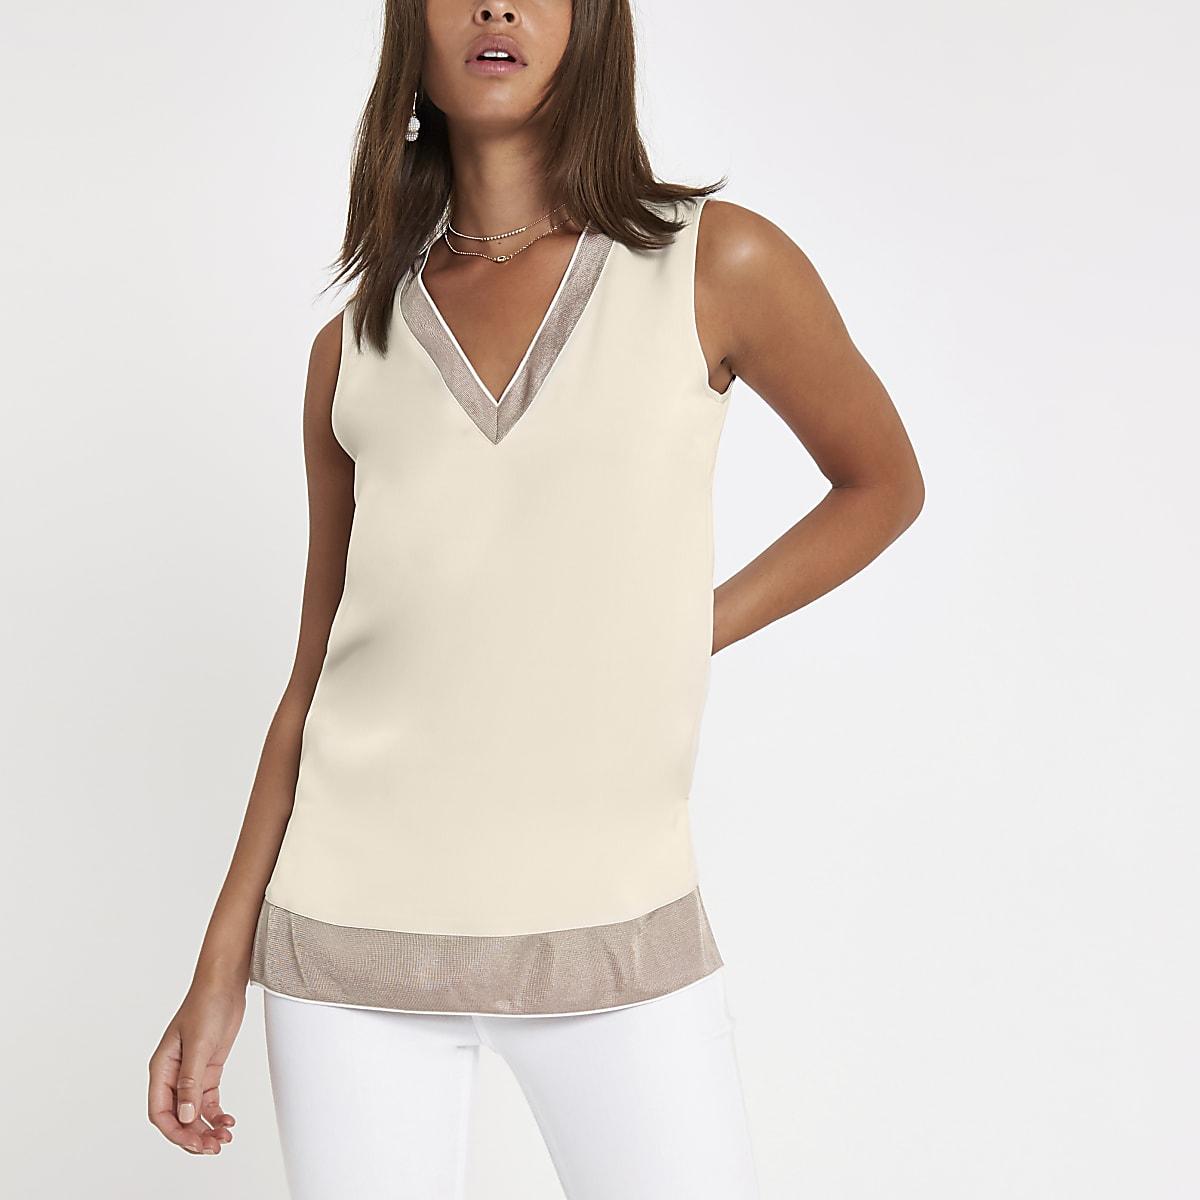 c9ea64c5f2c Cream ribbed V neck tunic top - Blouses - Tops - women